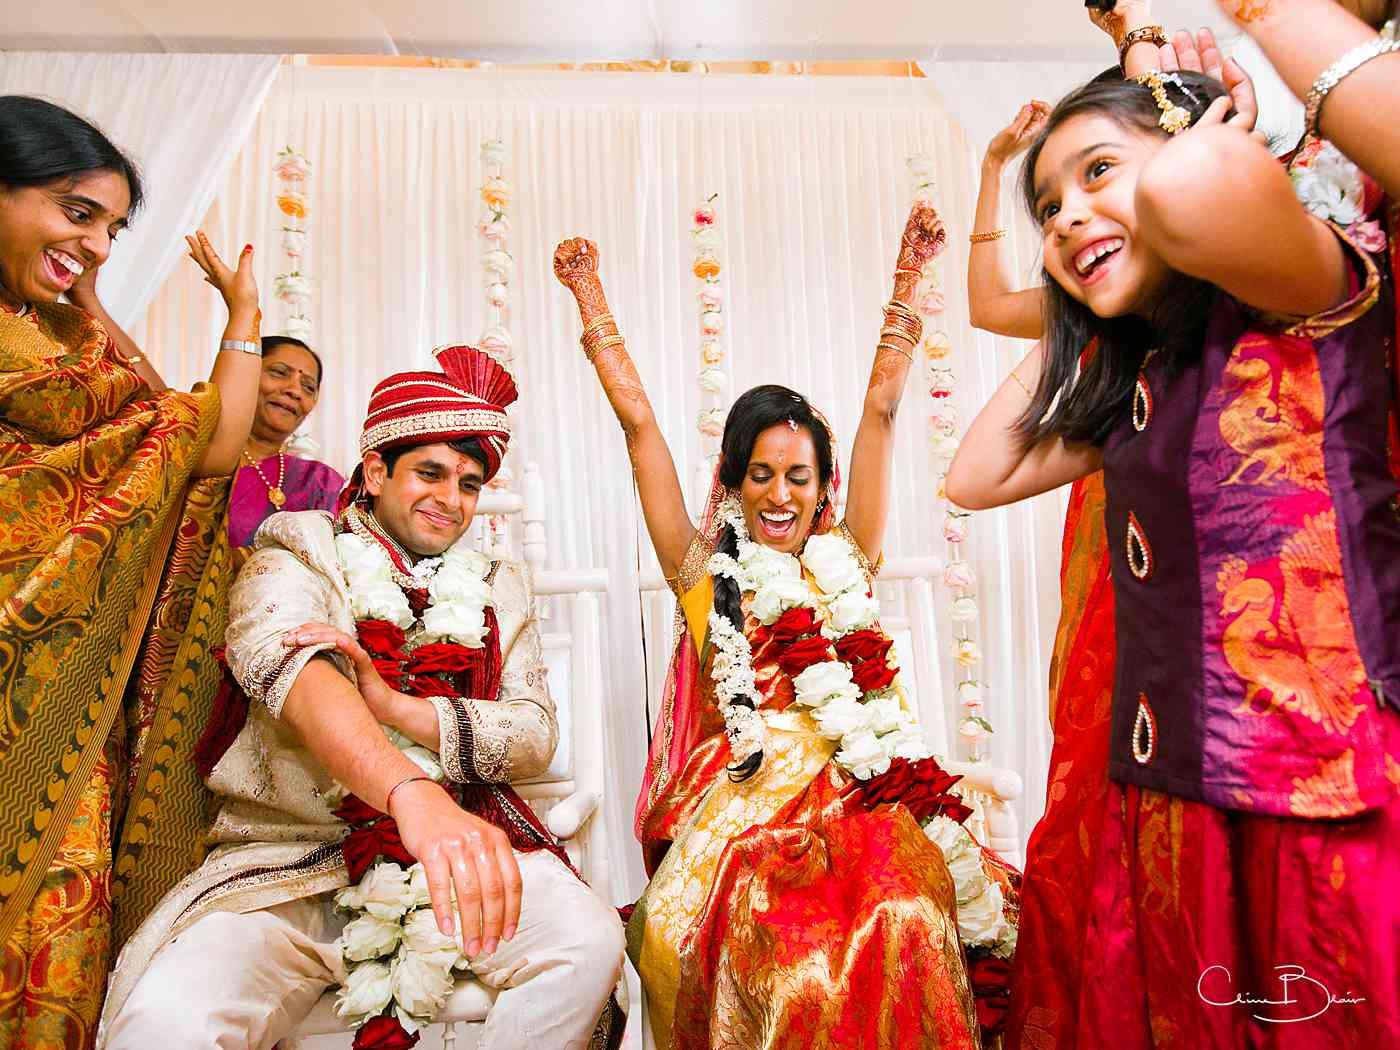 Jubilant bride winning game